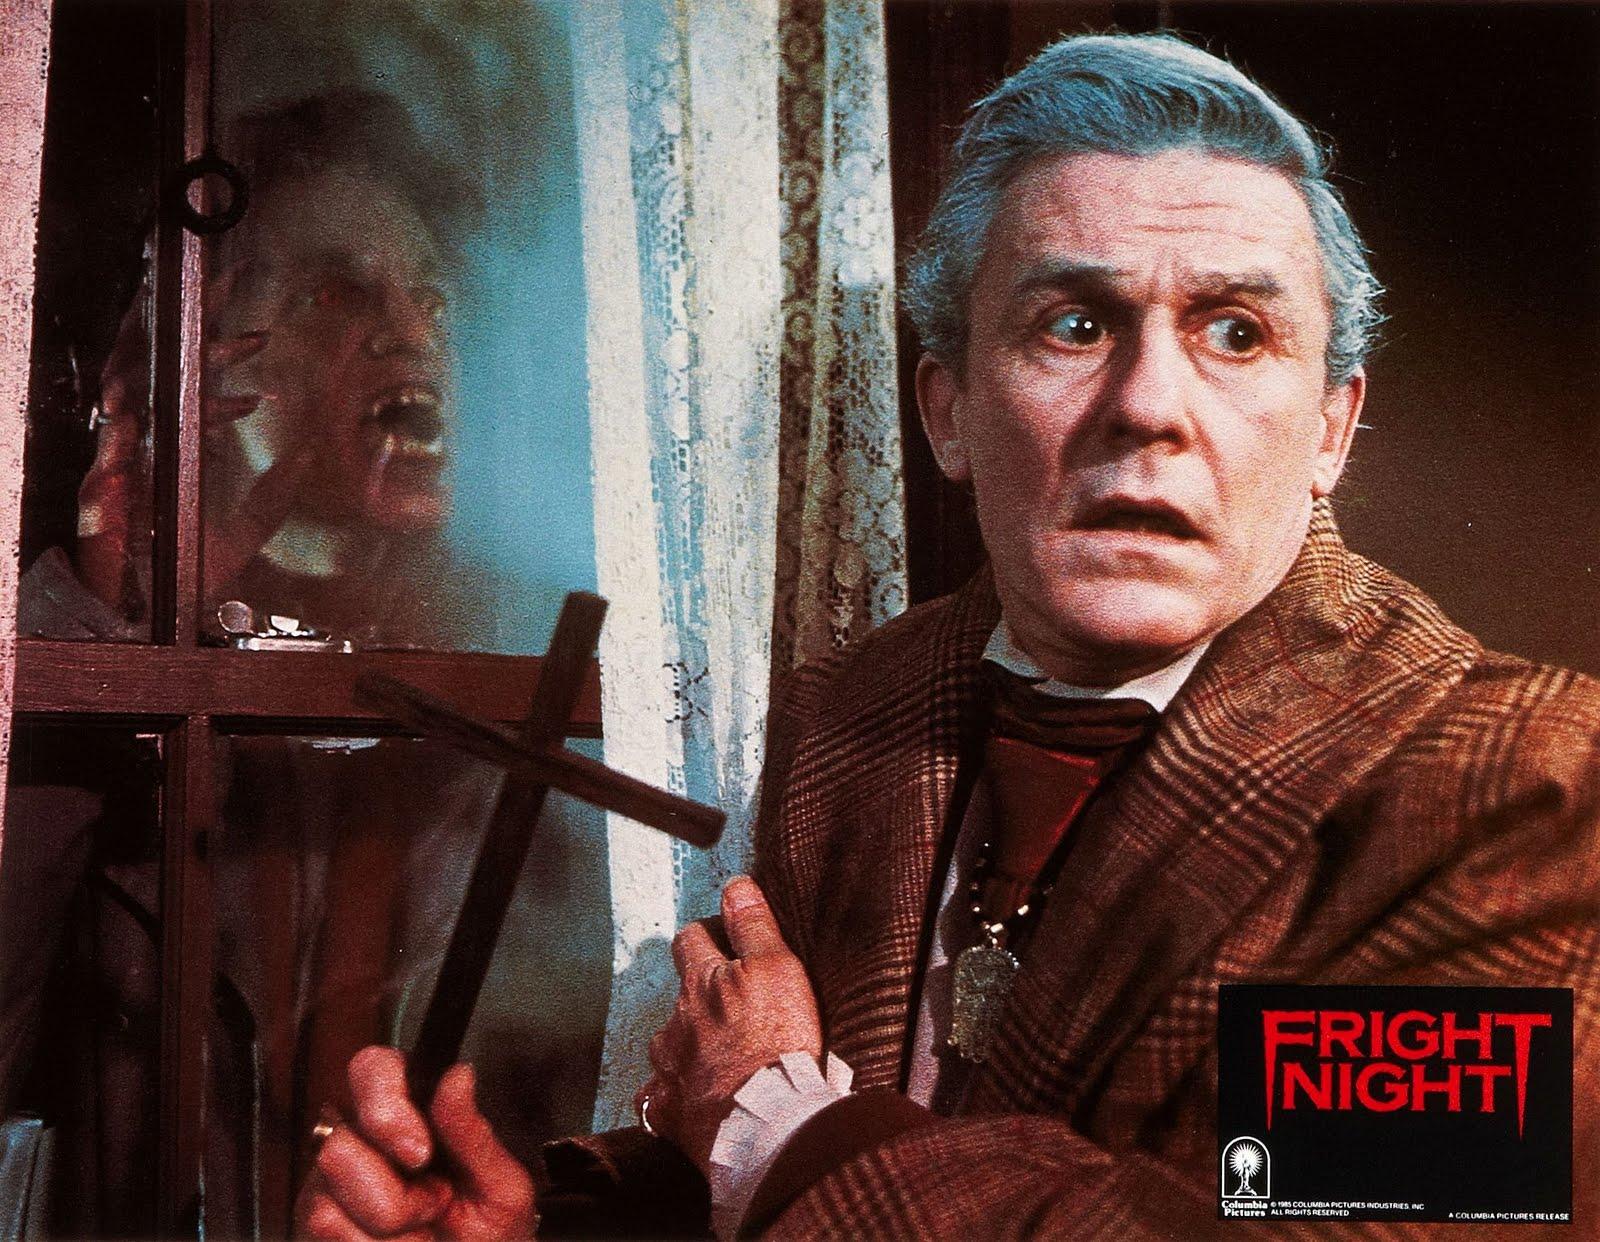 Happyotter: FRIGHT NIGHT (1985)